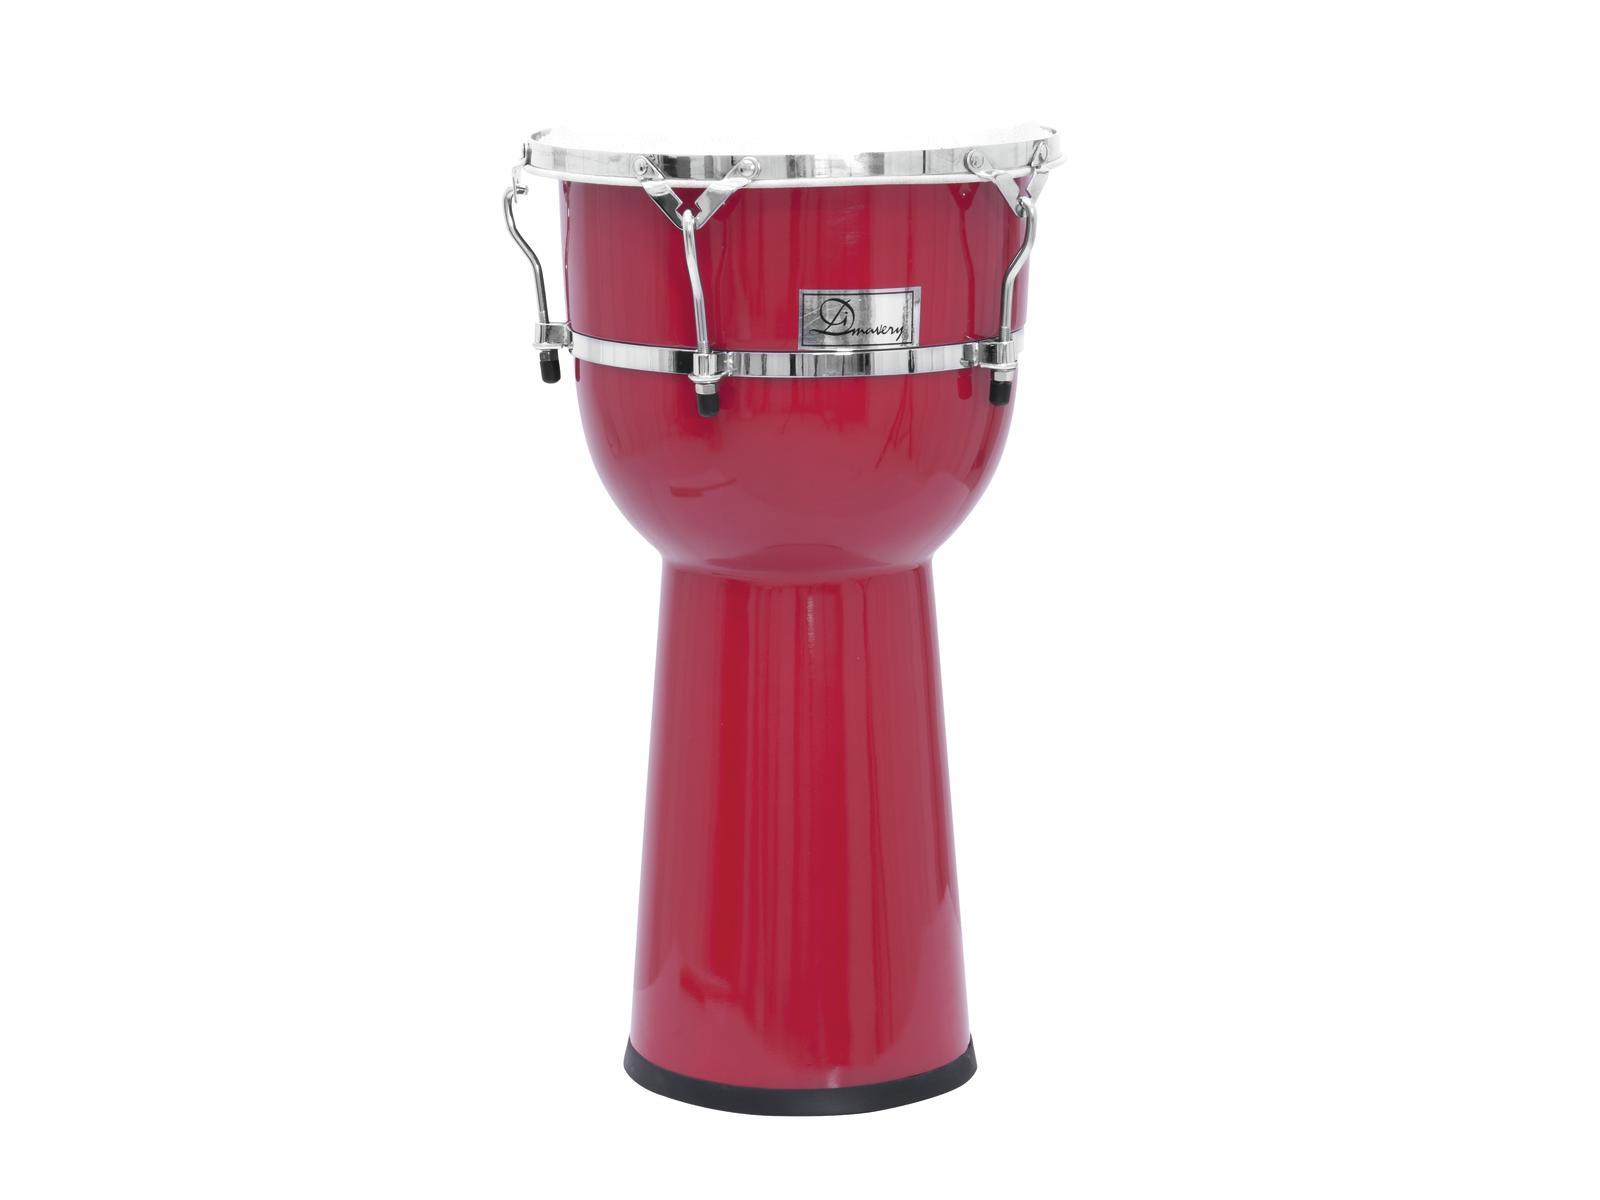 Djembe, tamburo, bongo, in plastica, rosso, DIMAVERY DJC-112